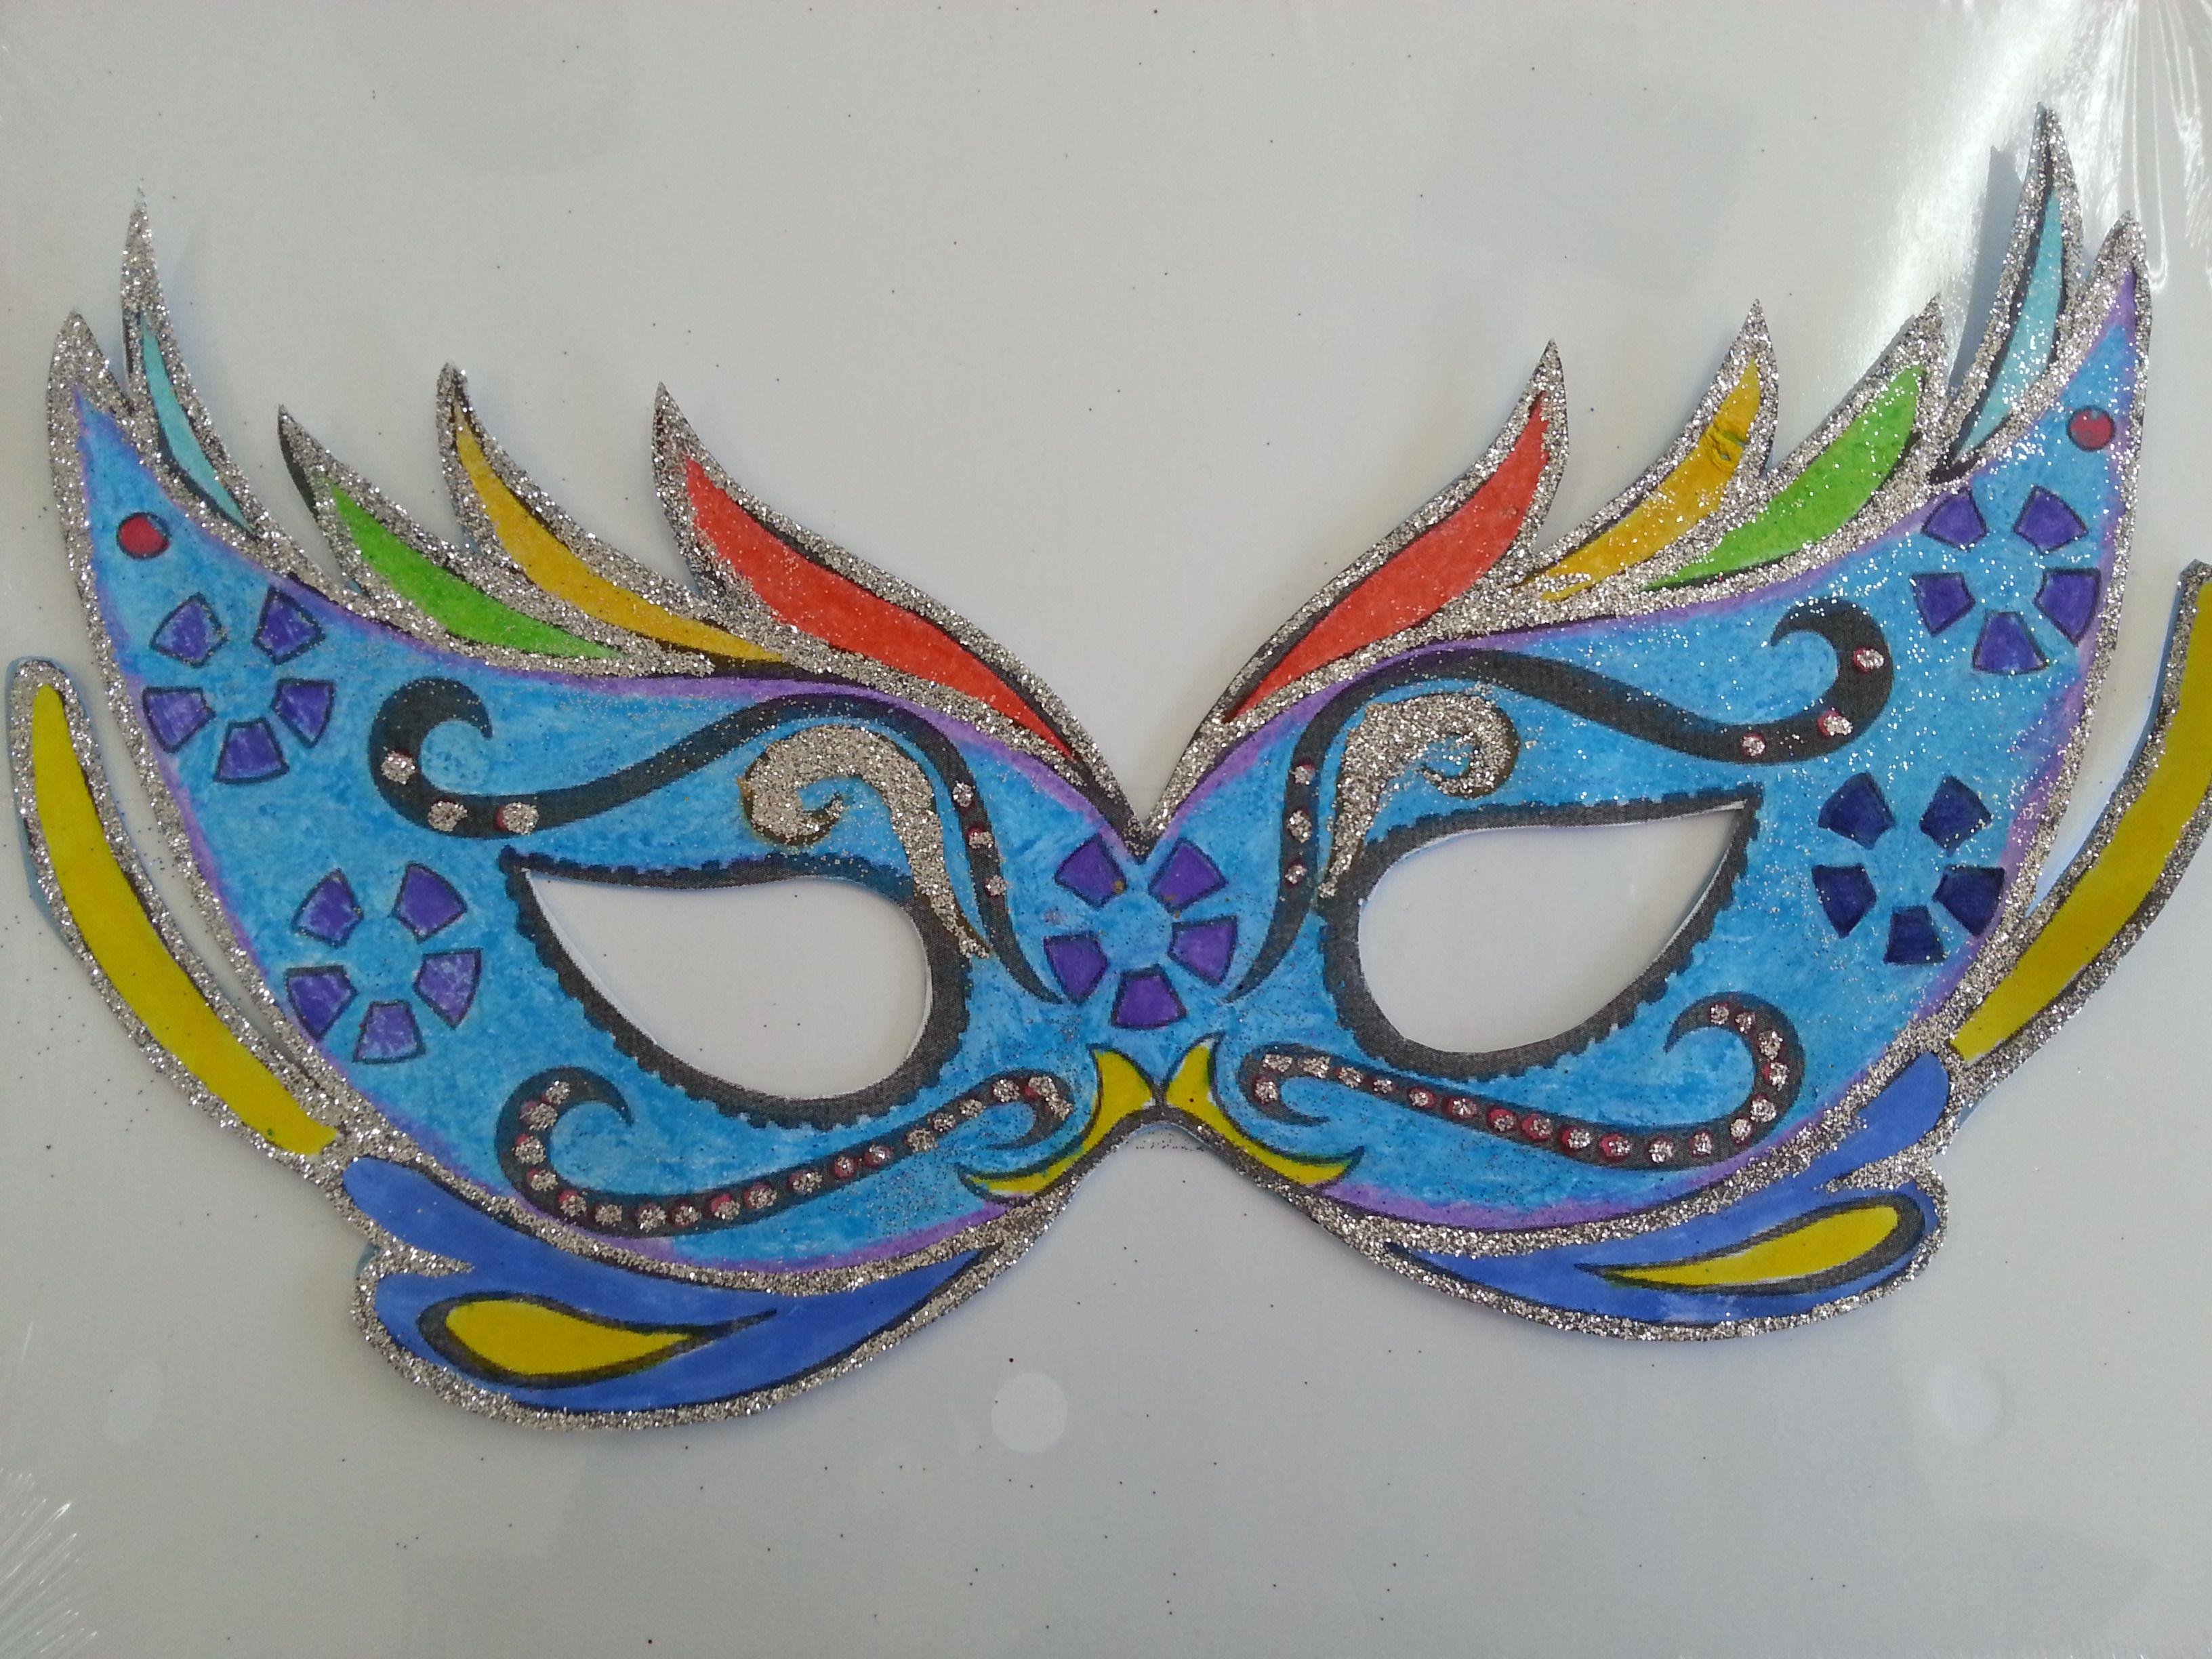 El blog de sami antifaz 3 1 carnaval carnival masks carnival y fancy dress - Mascaras para carnaval manualidades ...